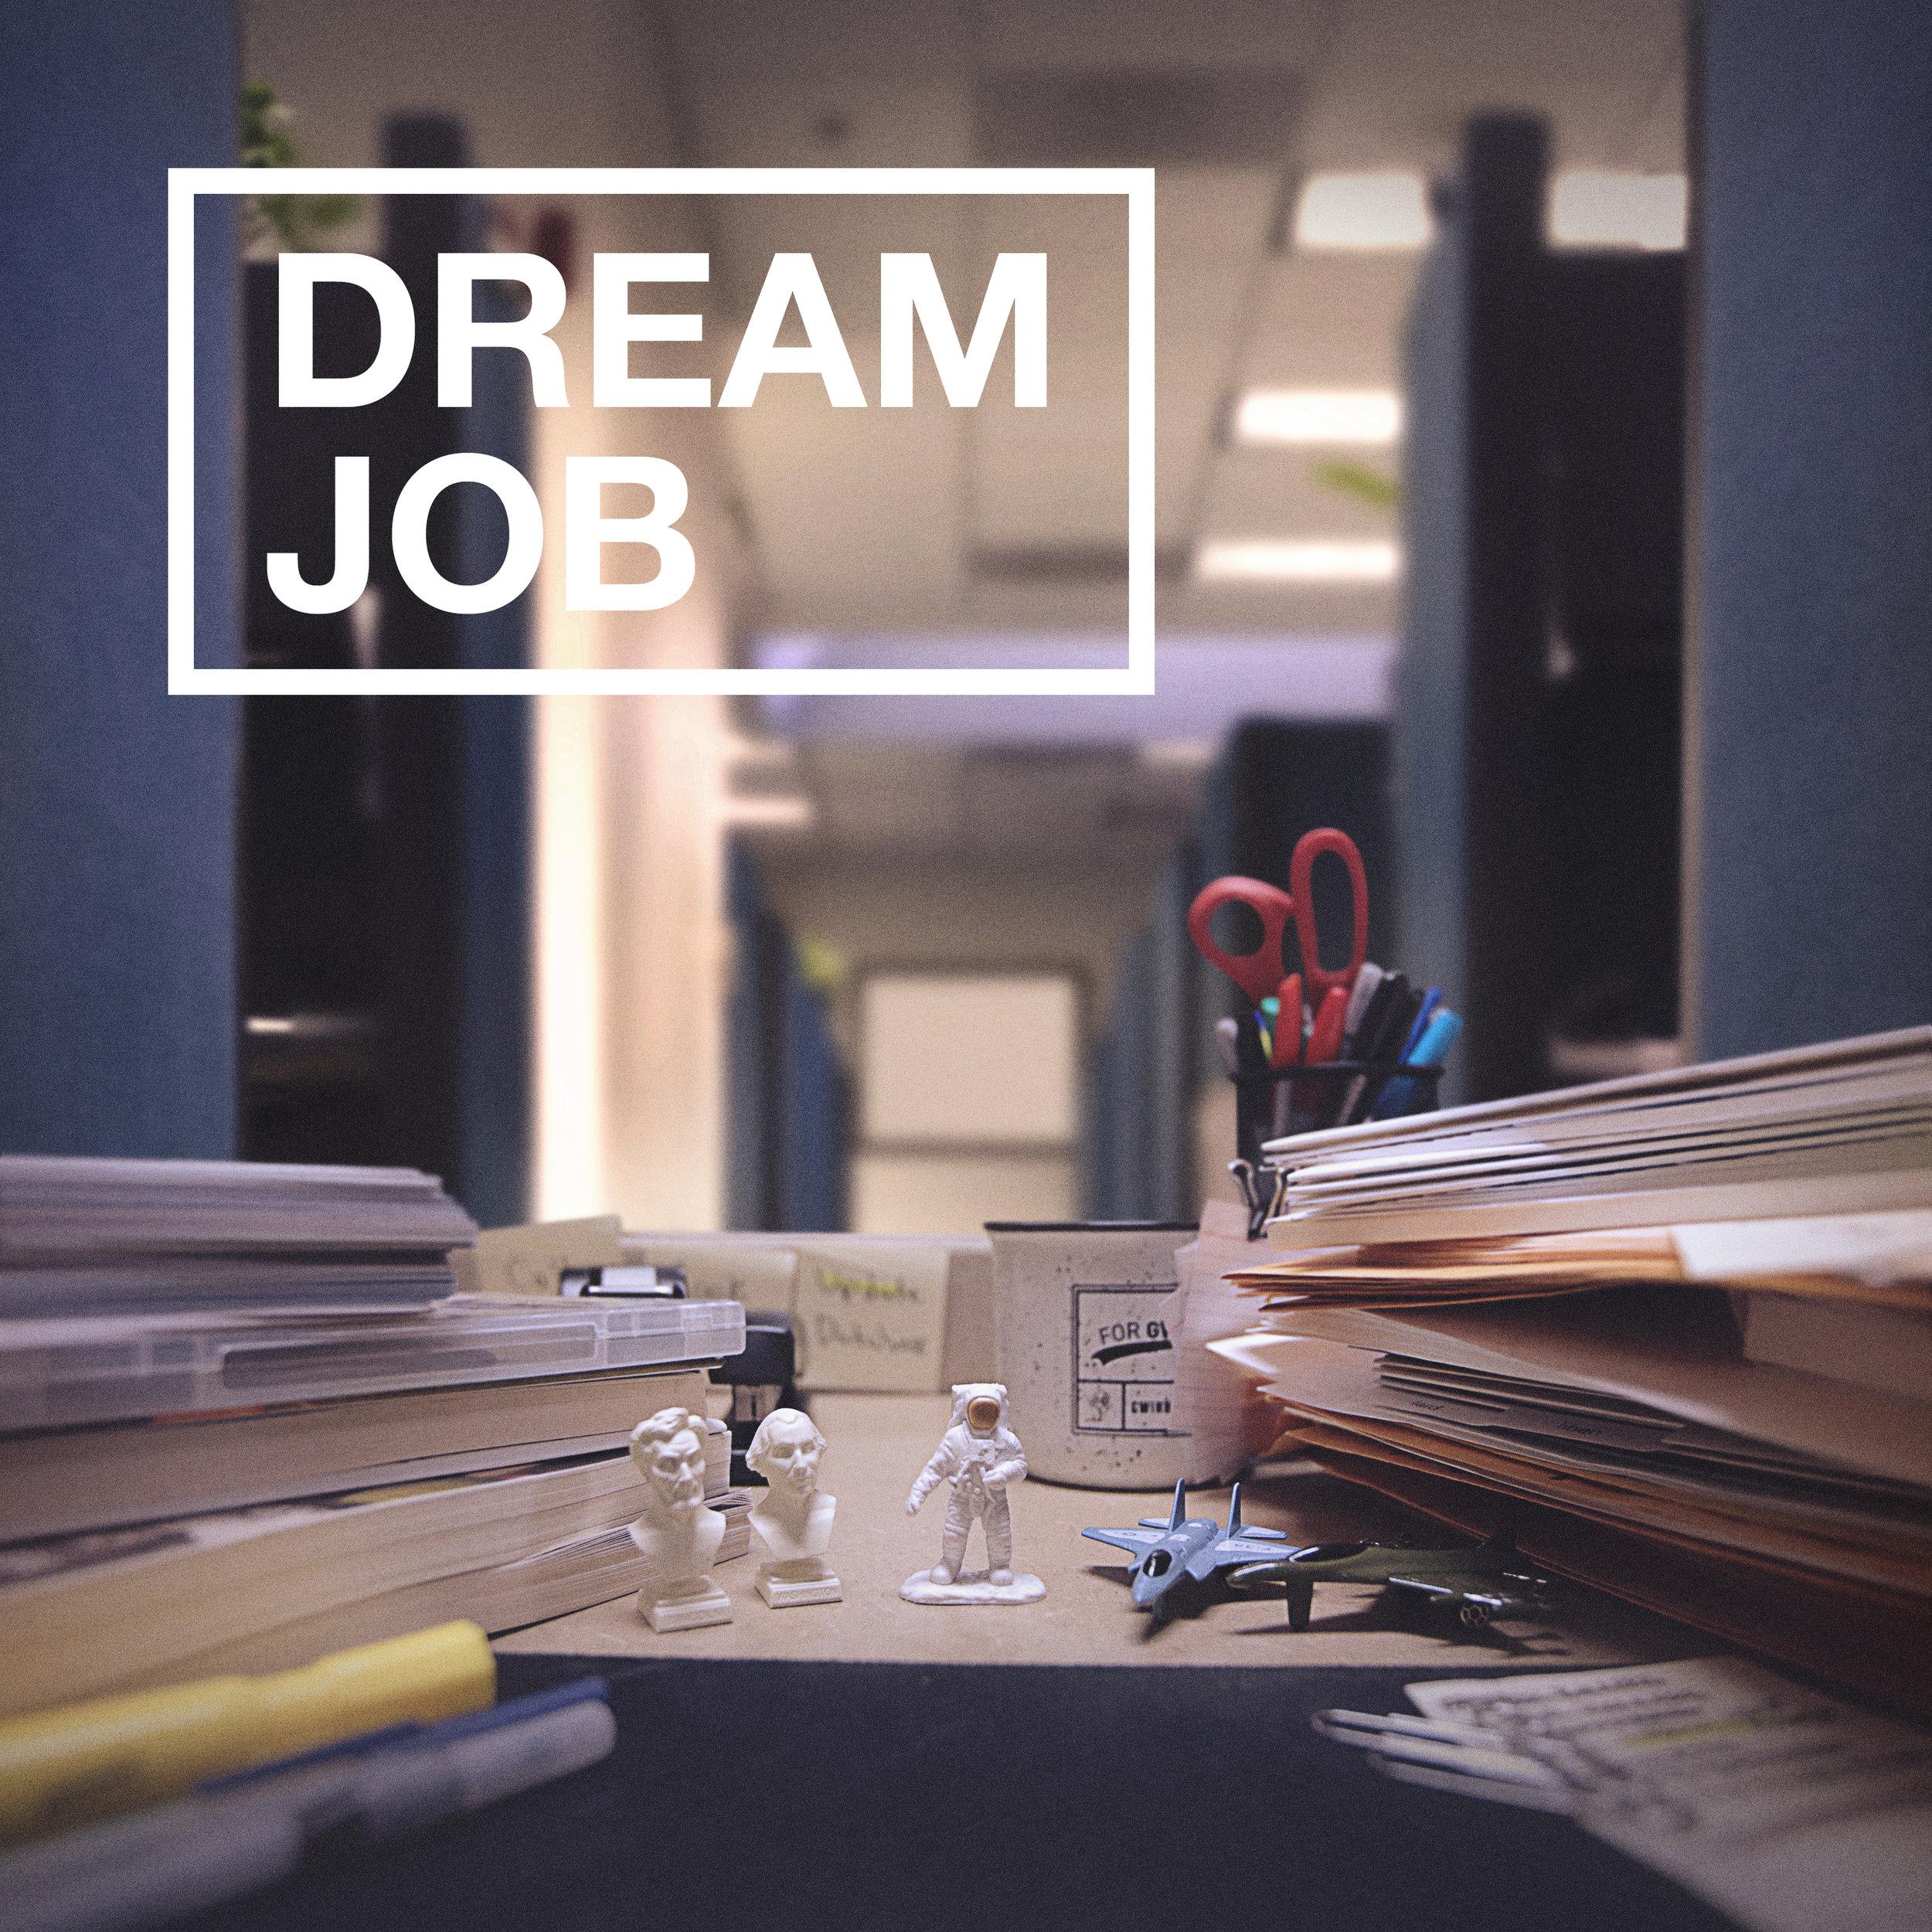 Dream_Job_square.jpg